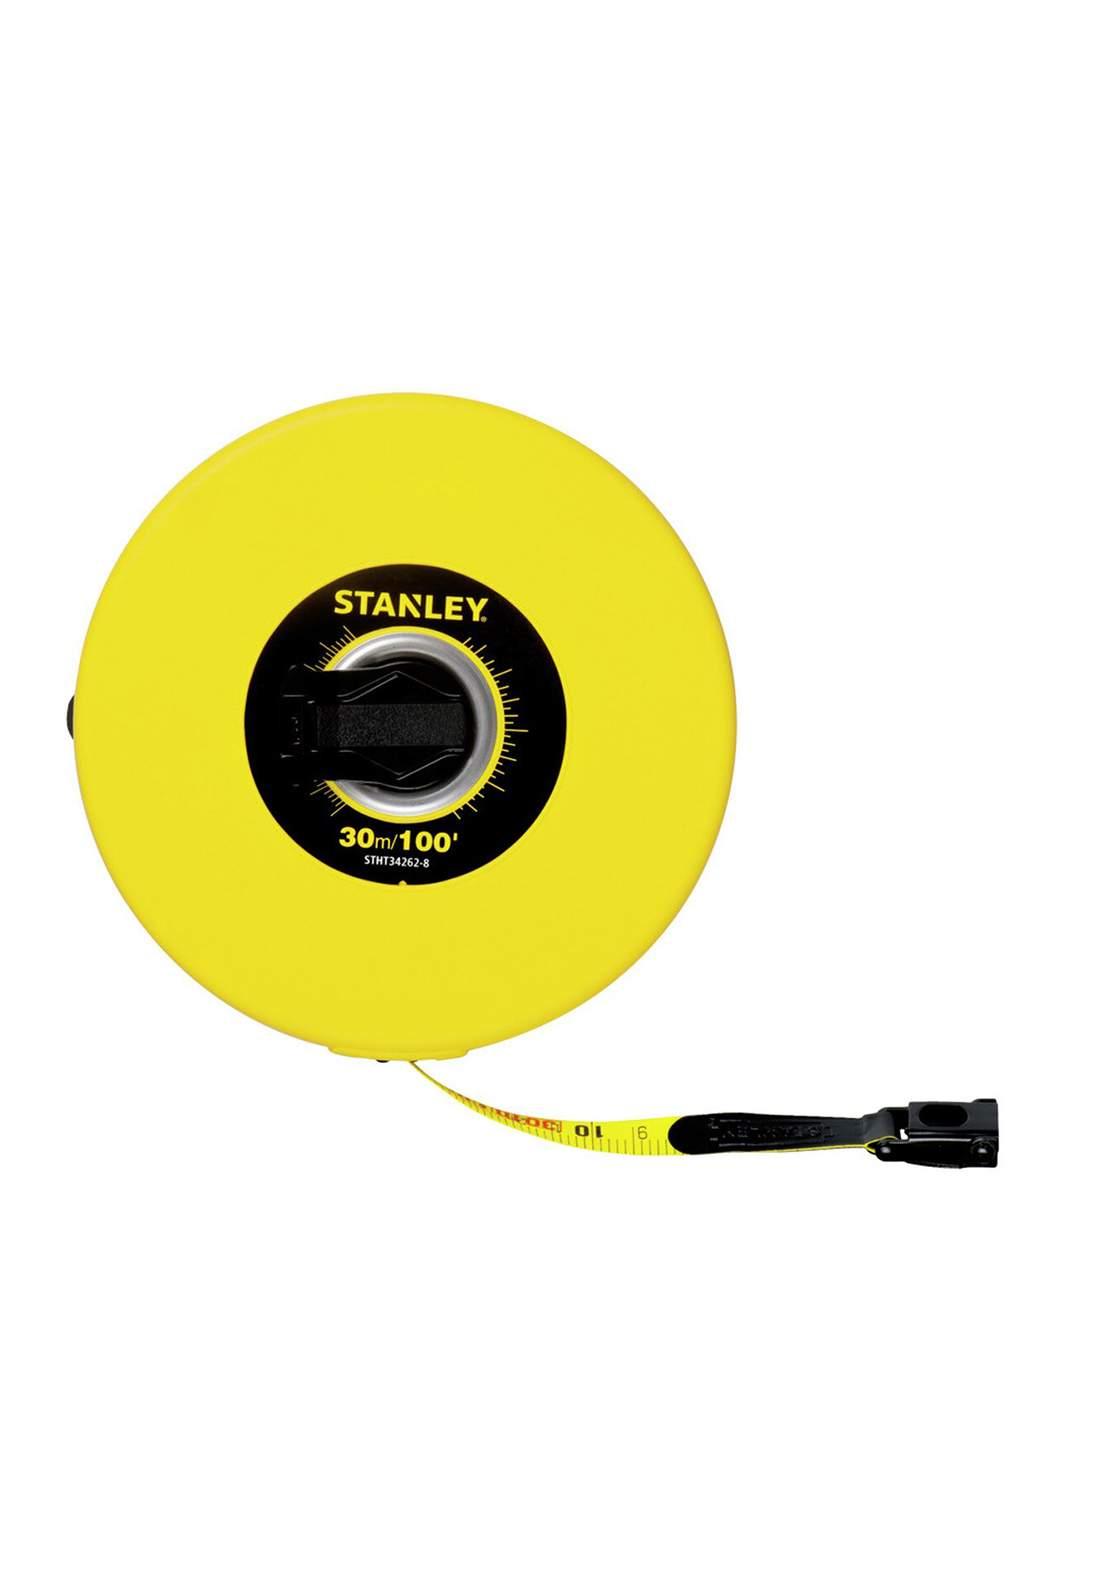 Stanley STHT34795-8 Measuring Tape 60M x 10mm فيتة(شفرة من الألياف الزجاجية  60 م)